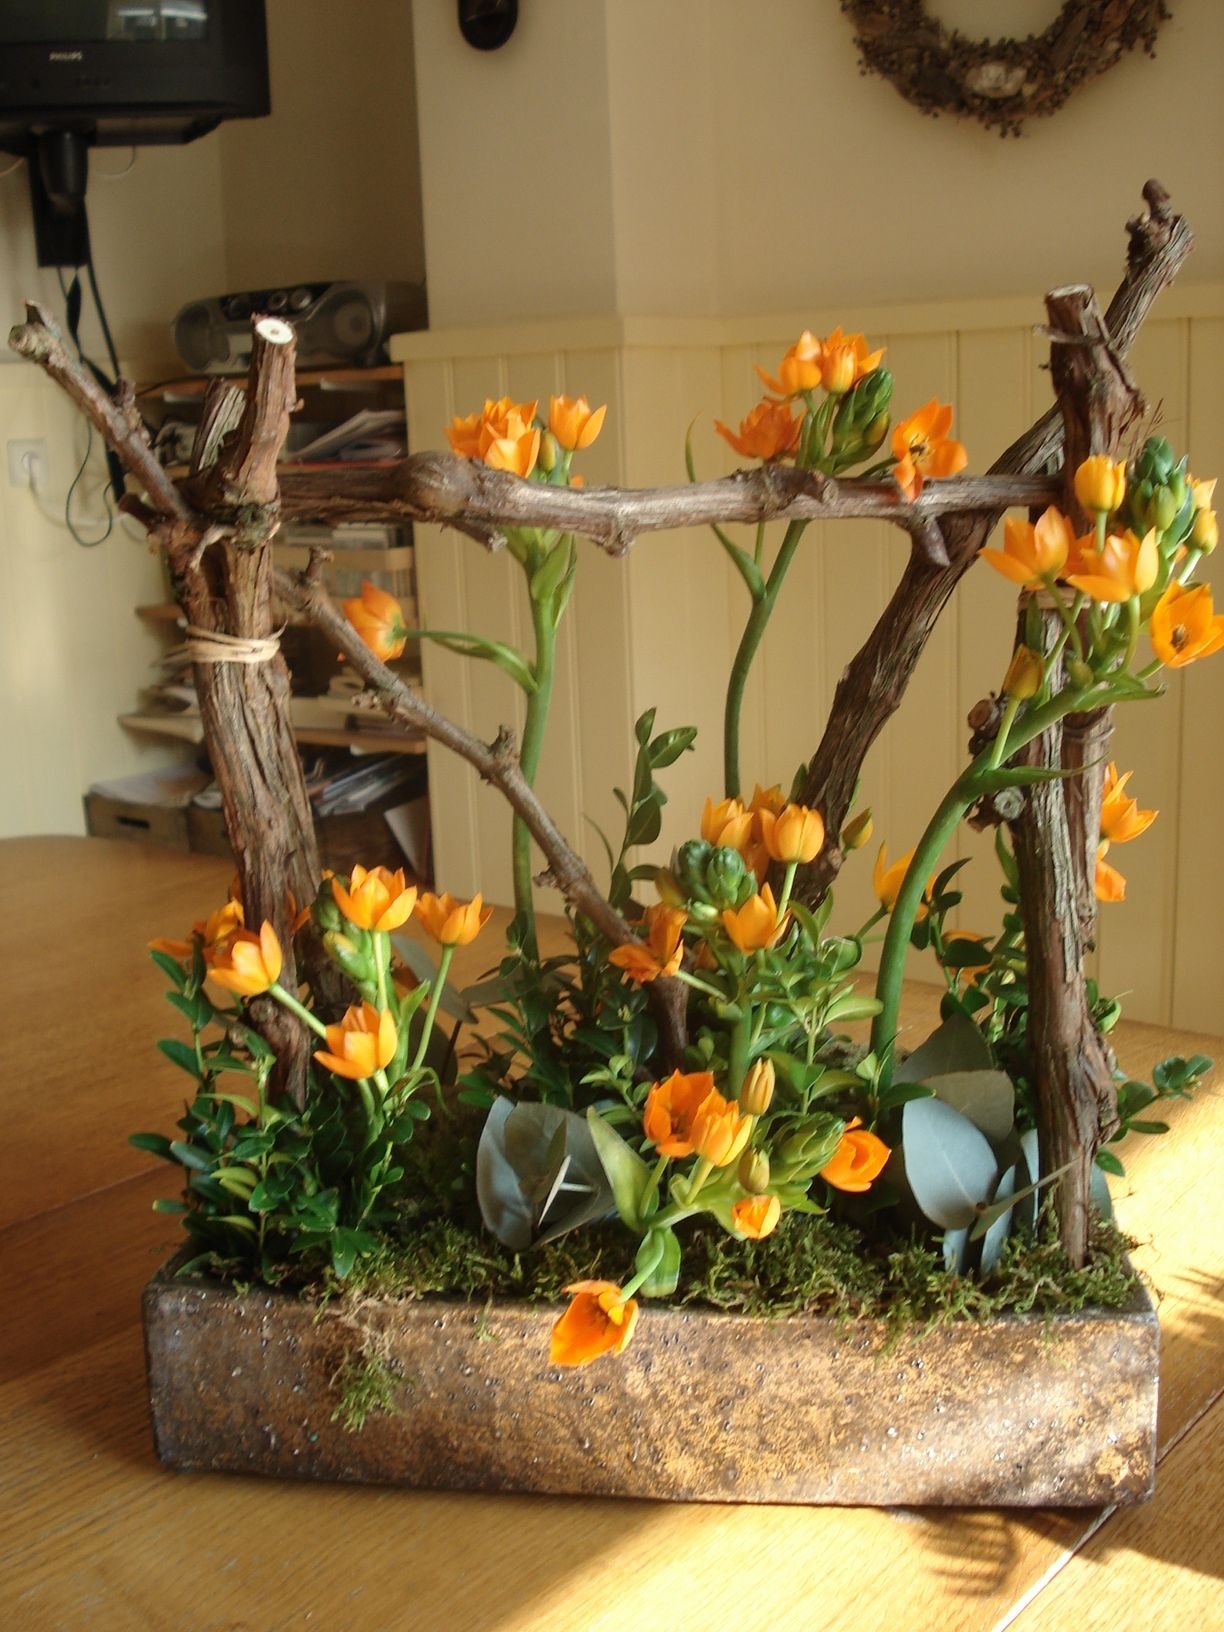 niadek ornitogalum garten pinterest fr hling blumendeko und ostern. Black Bedroom Furniture Sets. Home Design Ideas